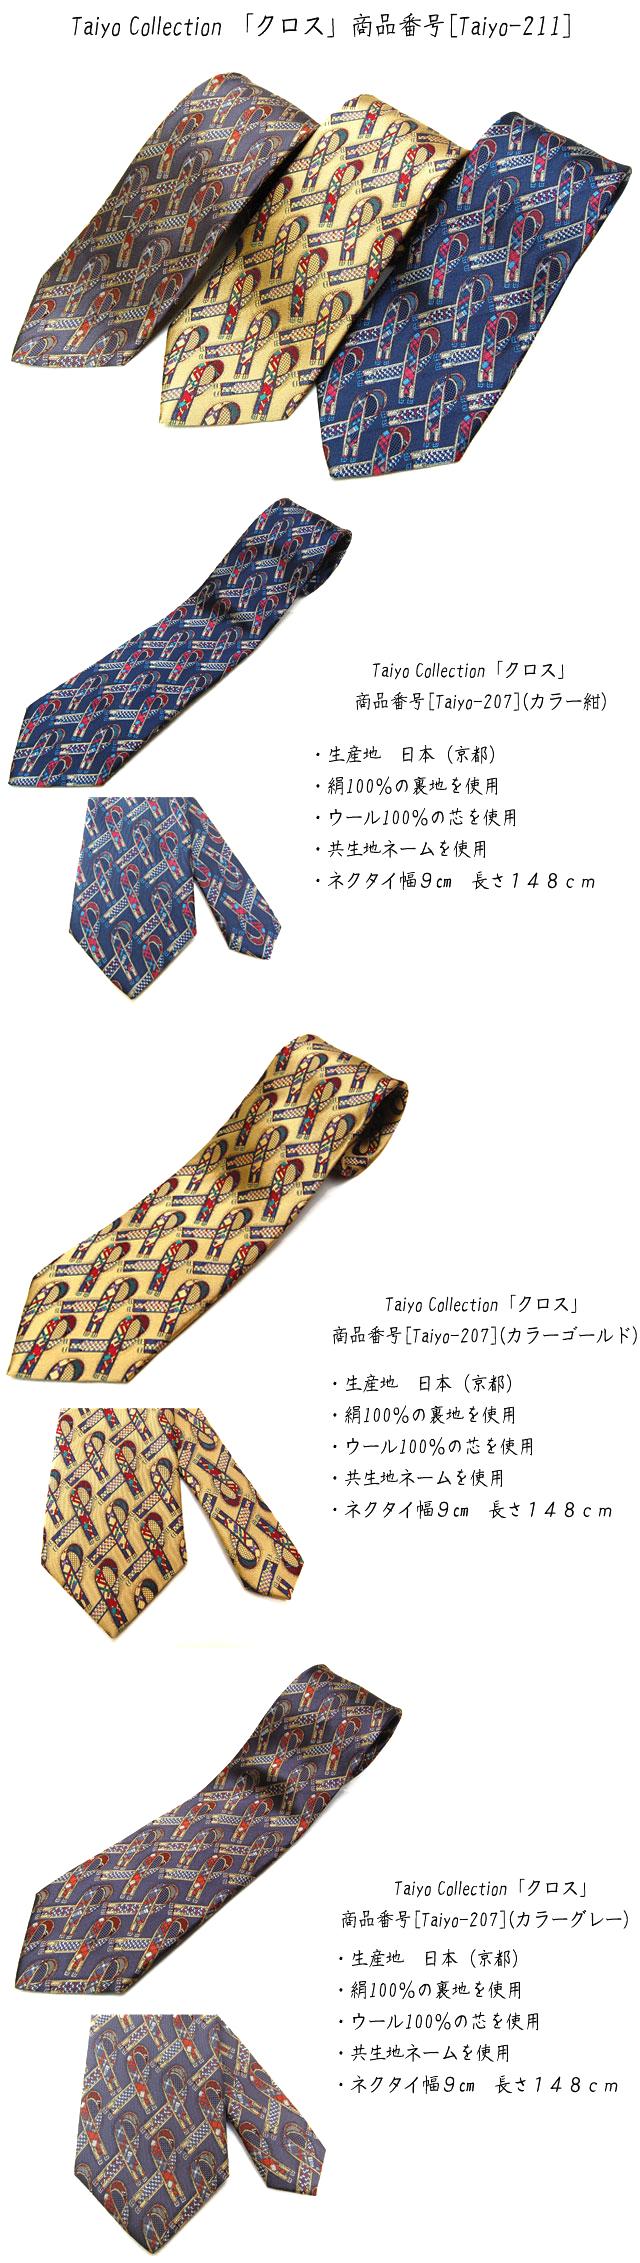 taiyo-211-2re